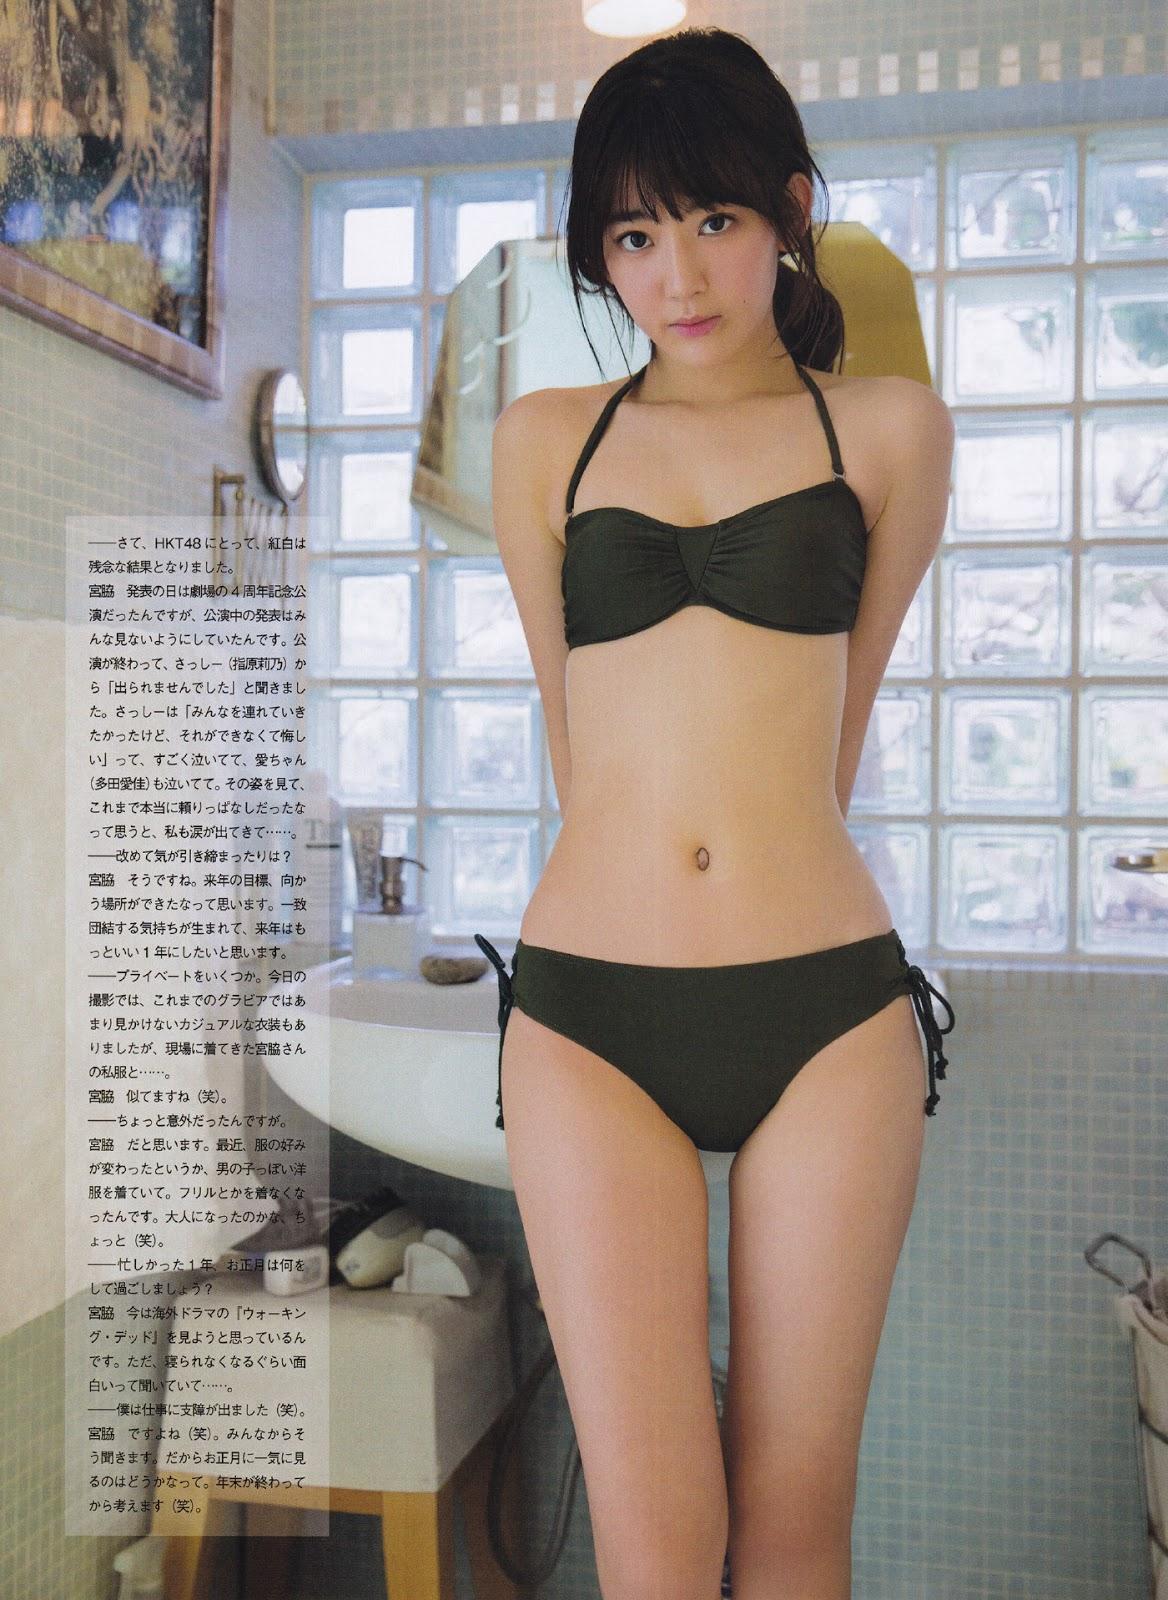 Miyawaki Sakura Image #183325 - Asiachan KPOP Image Board